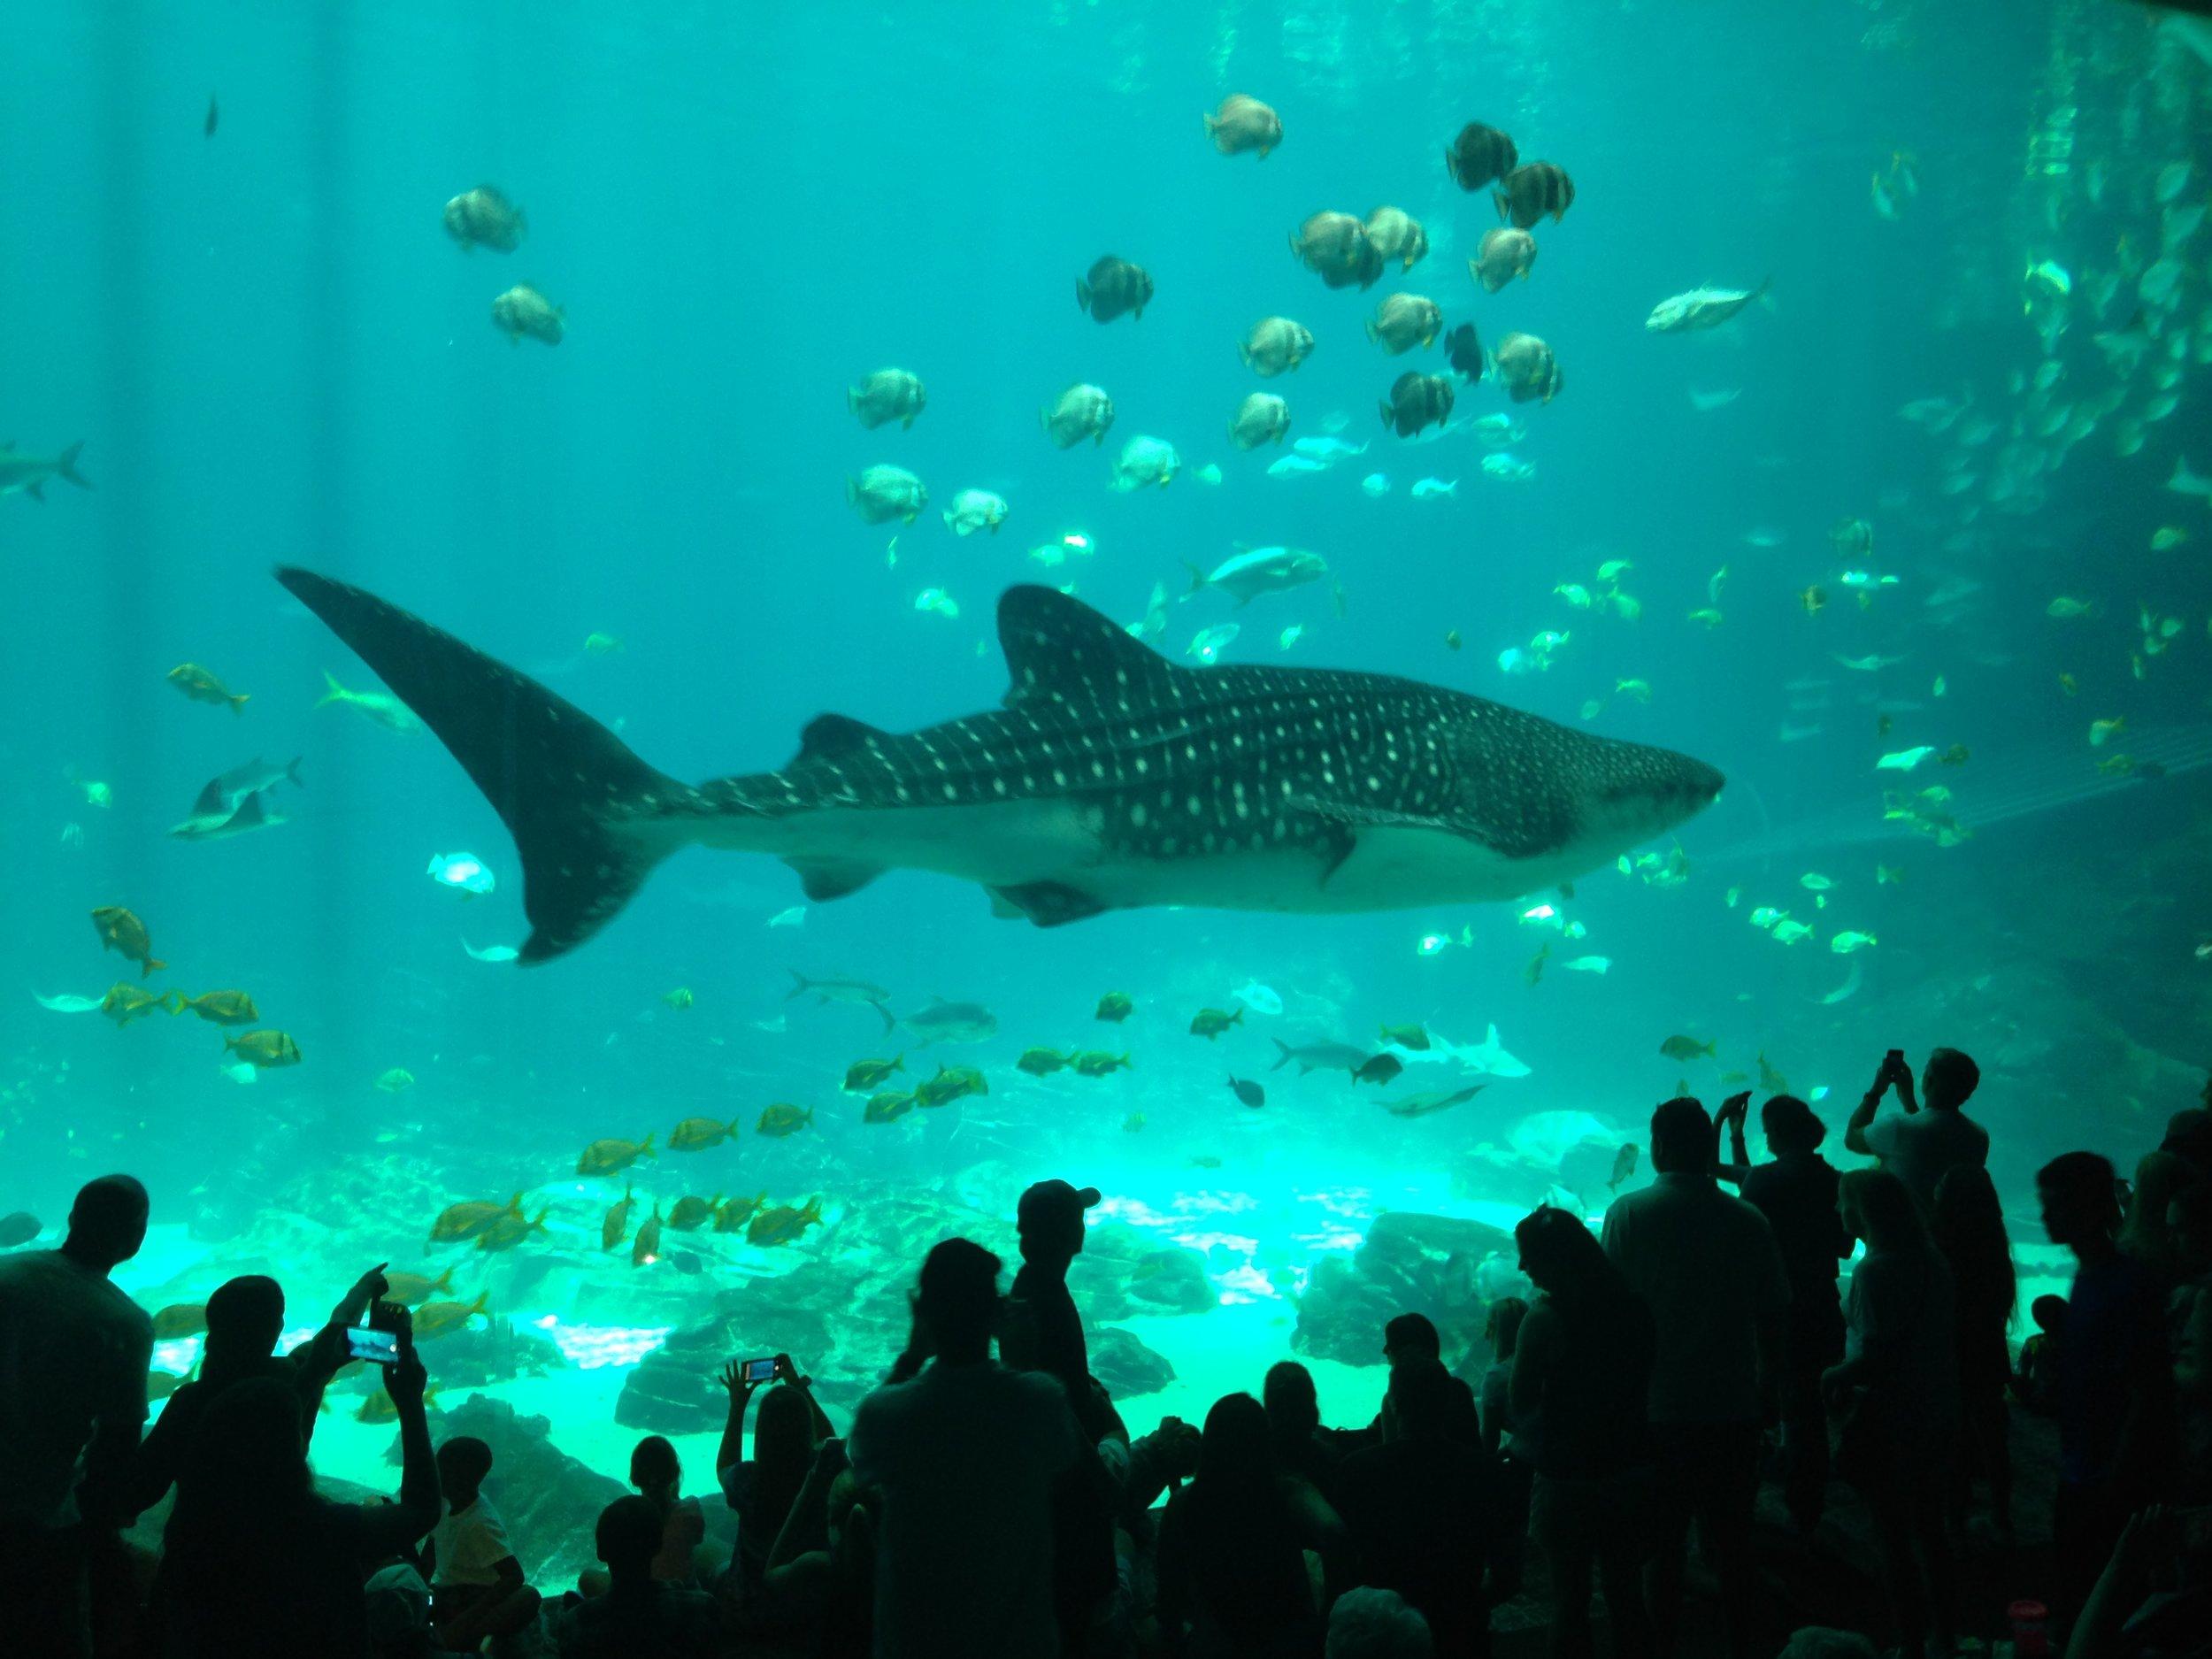 Photo Sharron M. Swain. One of the whale sharks at the Georgia Aquarium.